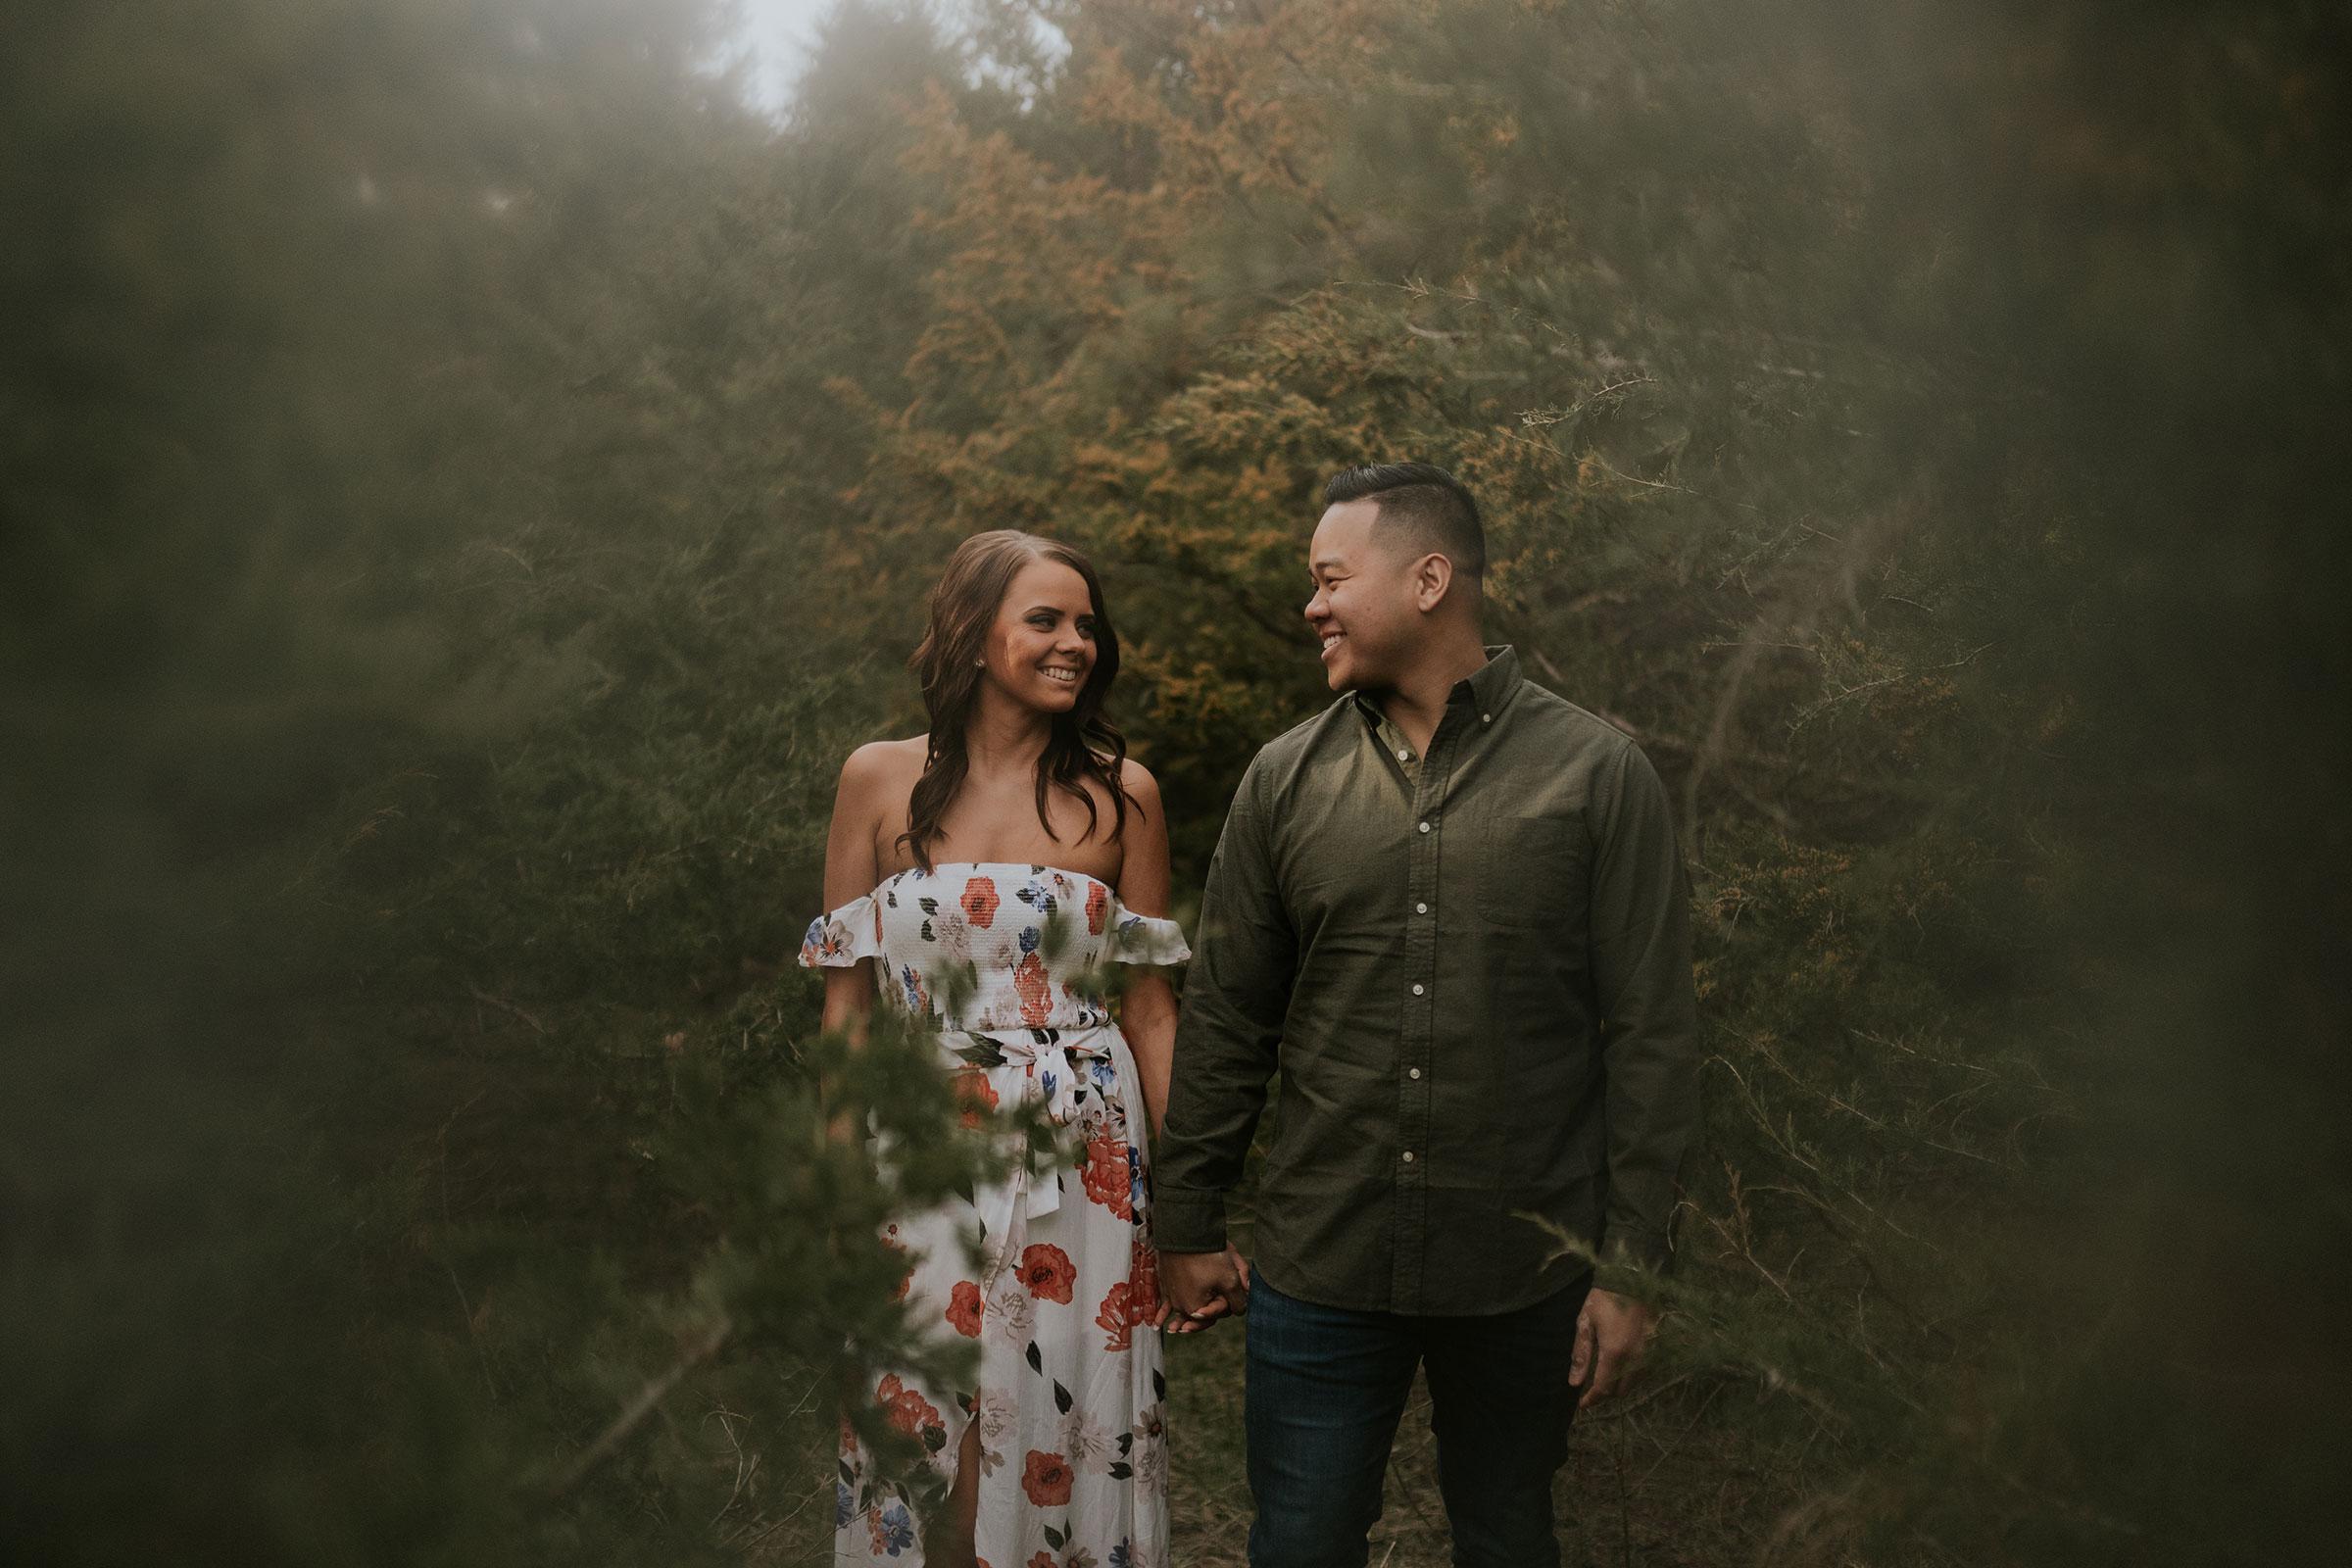 couple-standing-holding-hands-amongst-trees-iris-aisle-winterset-iowa-raelyn-ramey-photography.jpg